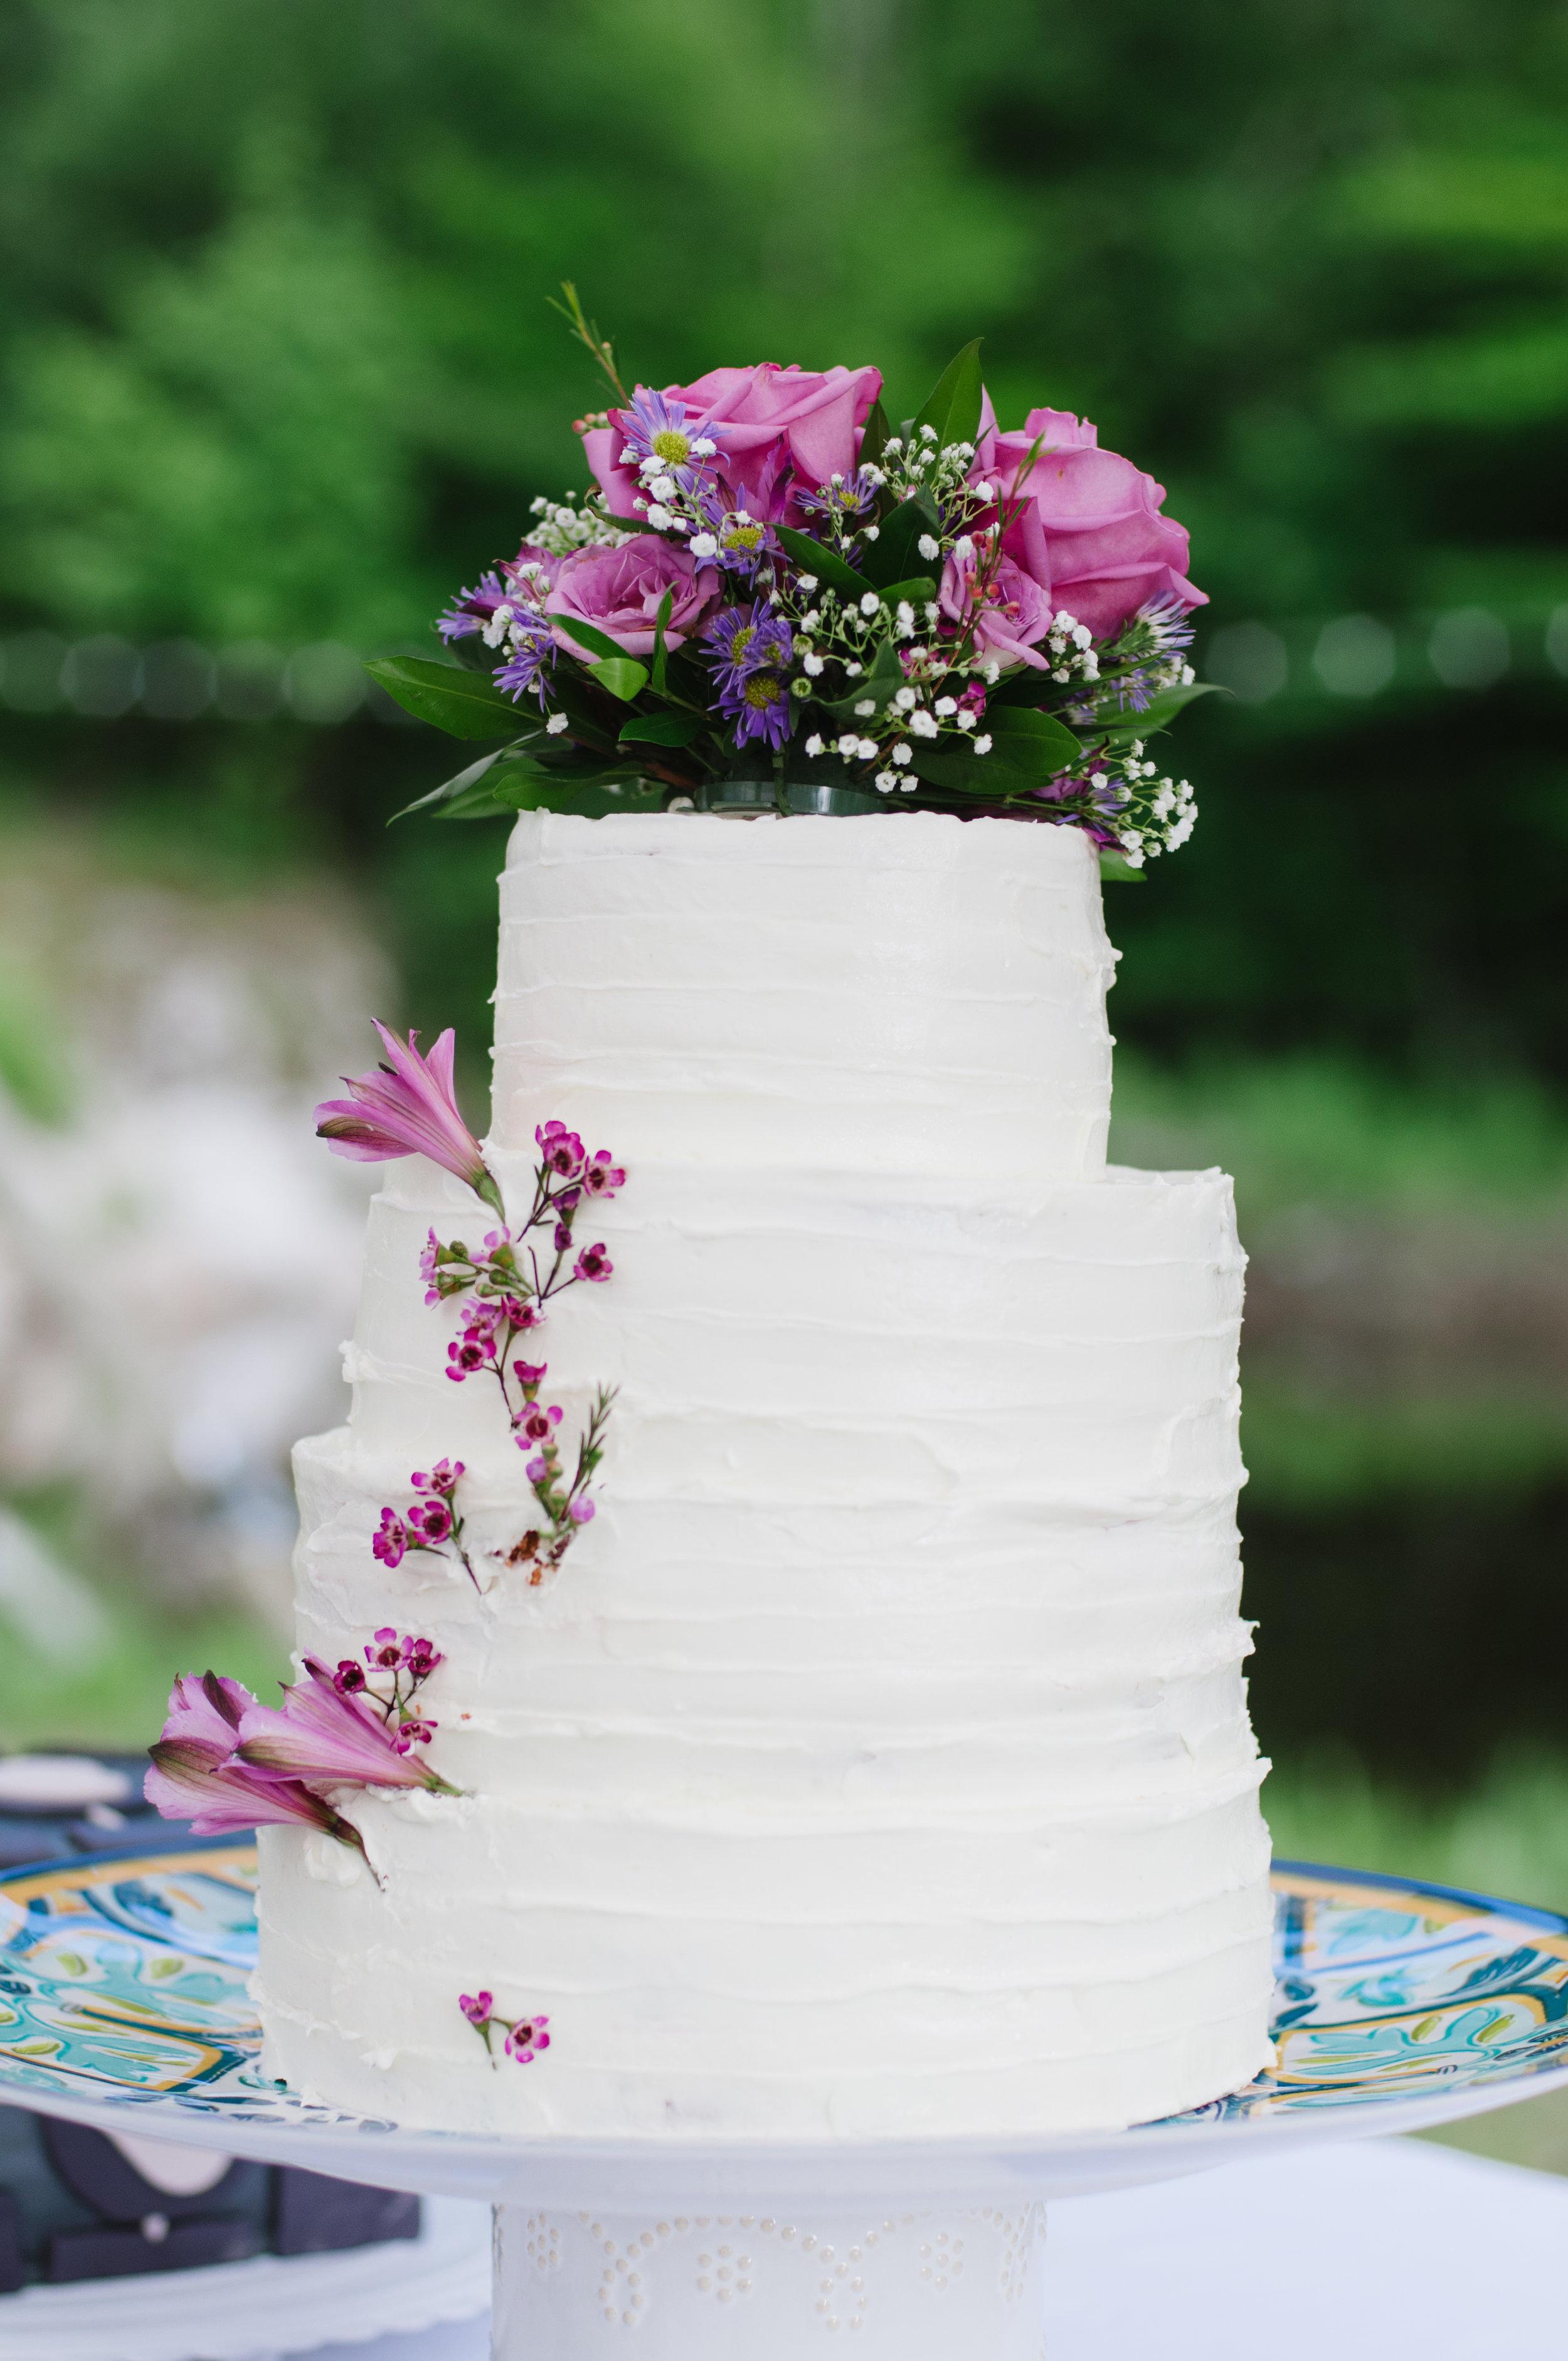 NH-Wedding-2015-9.jpg